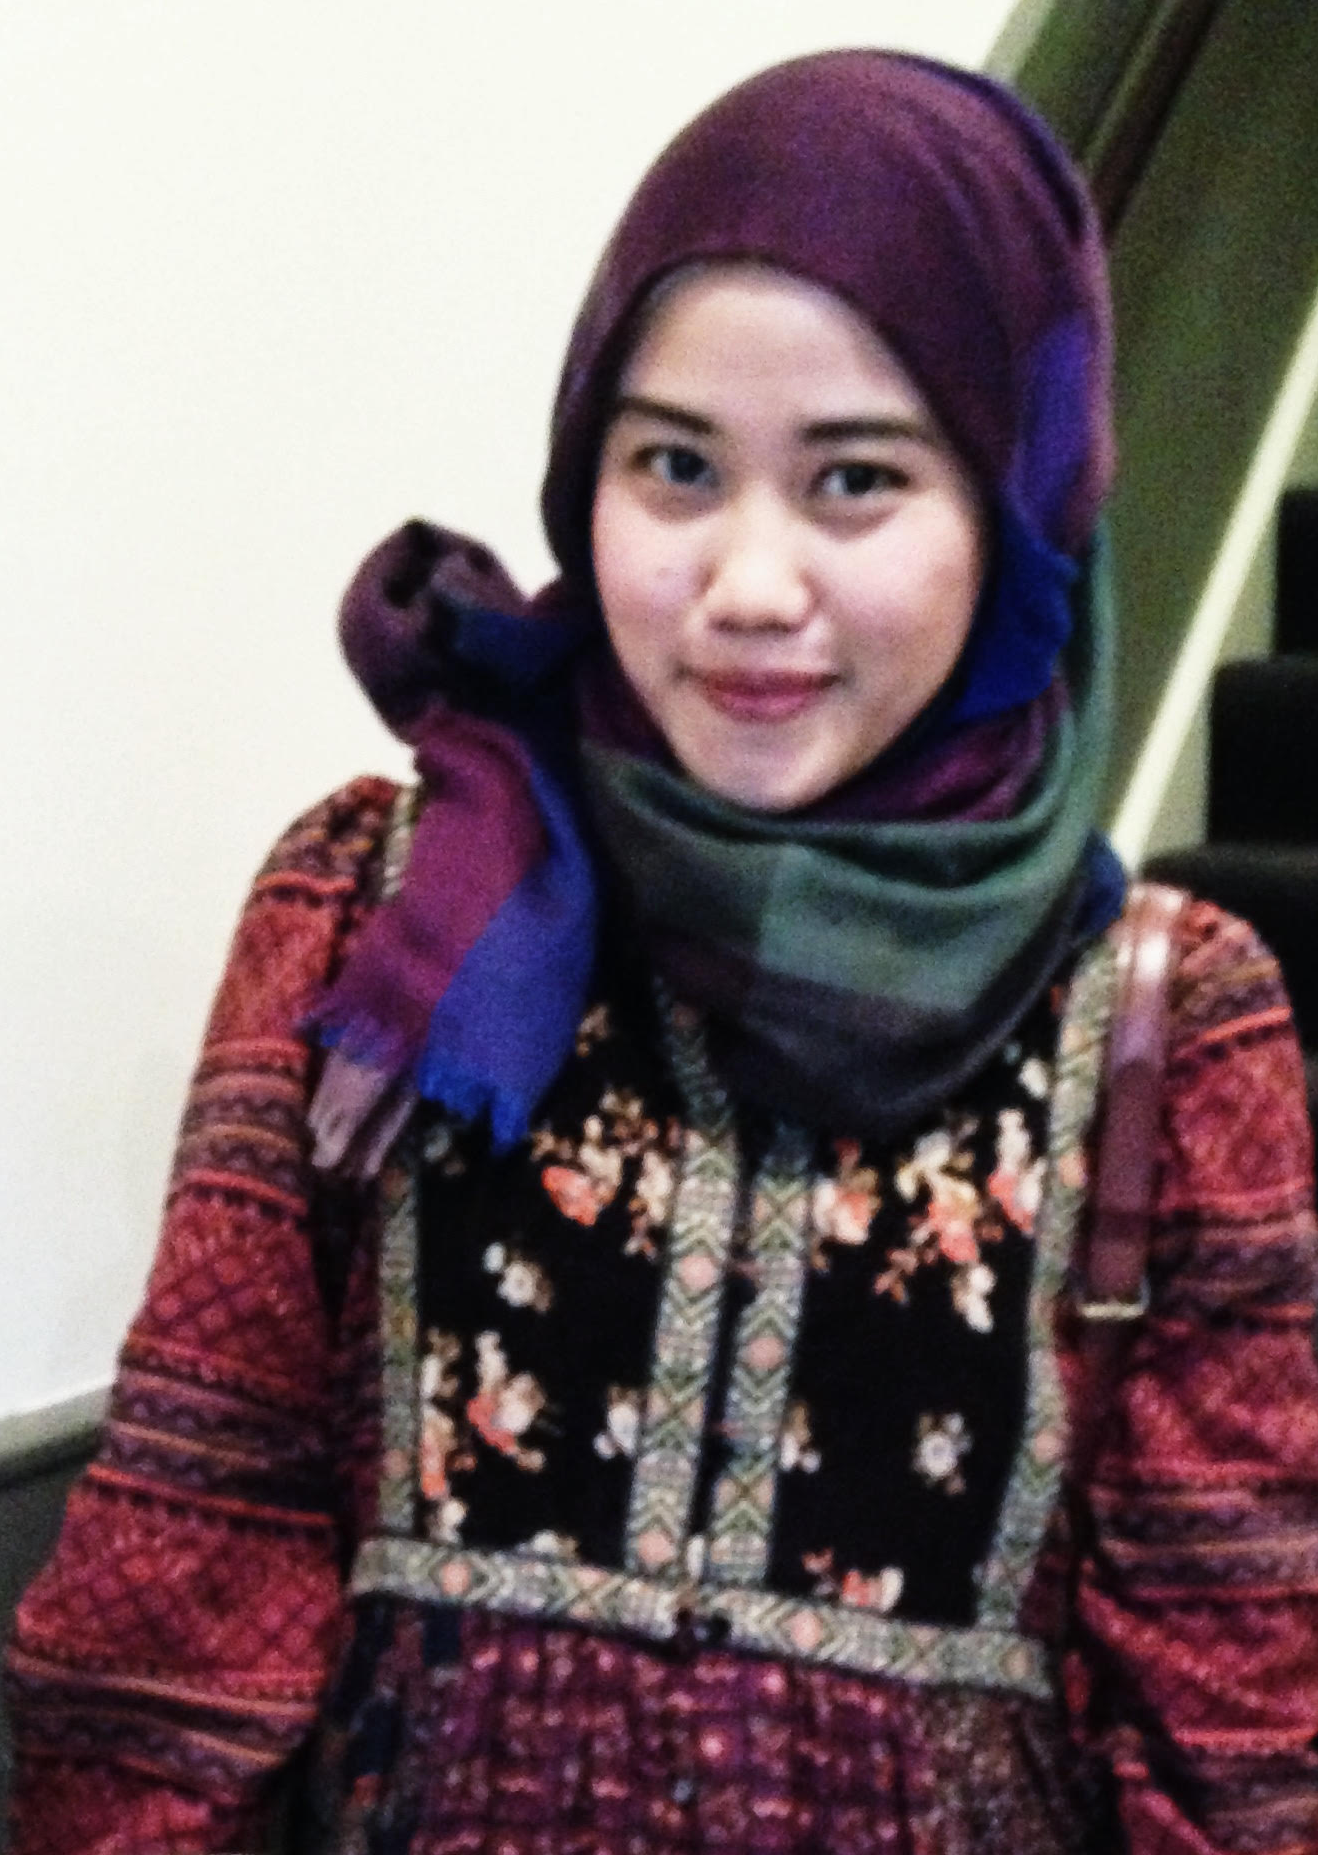 Aztia is a member of our Newport team, having been a Coordinator since 2015. -